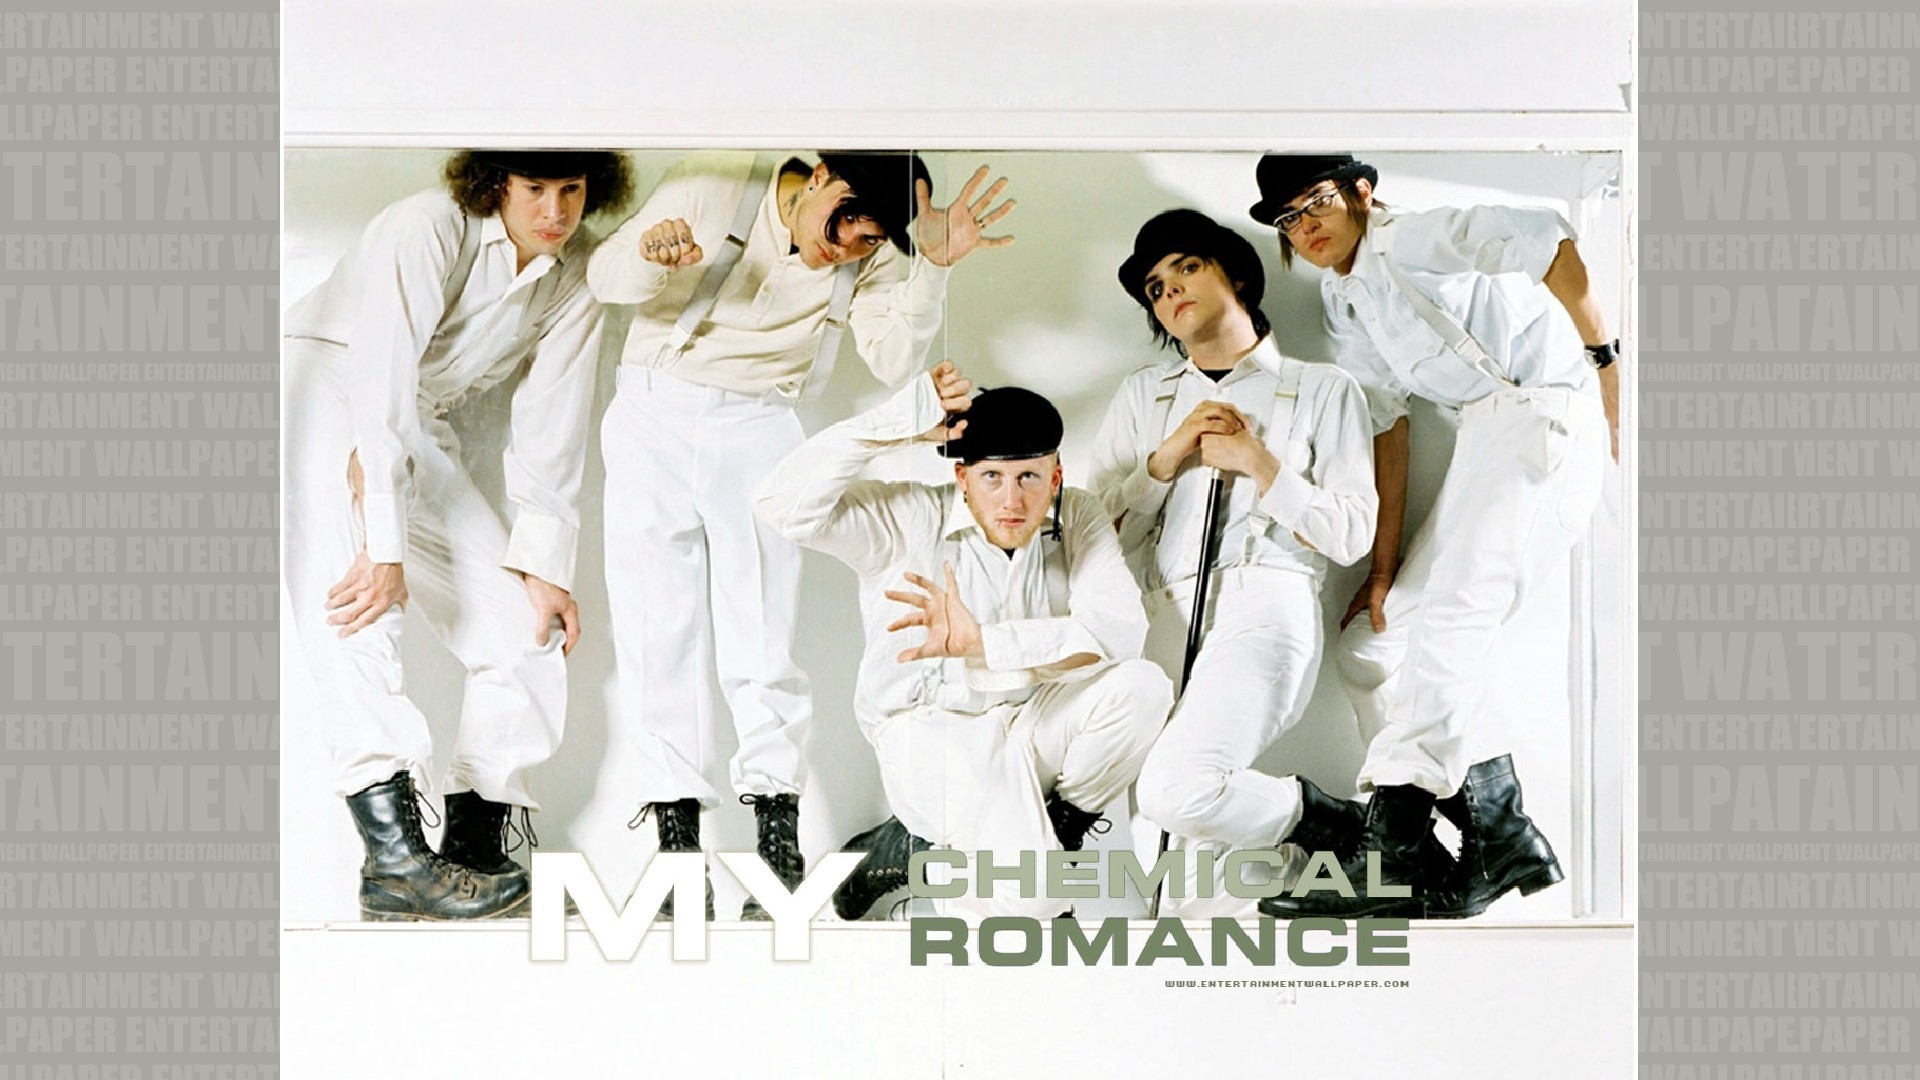 … my chemical romance wallpaper 40007498 desktop …